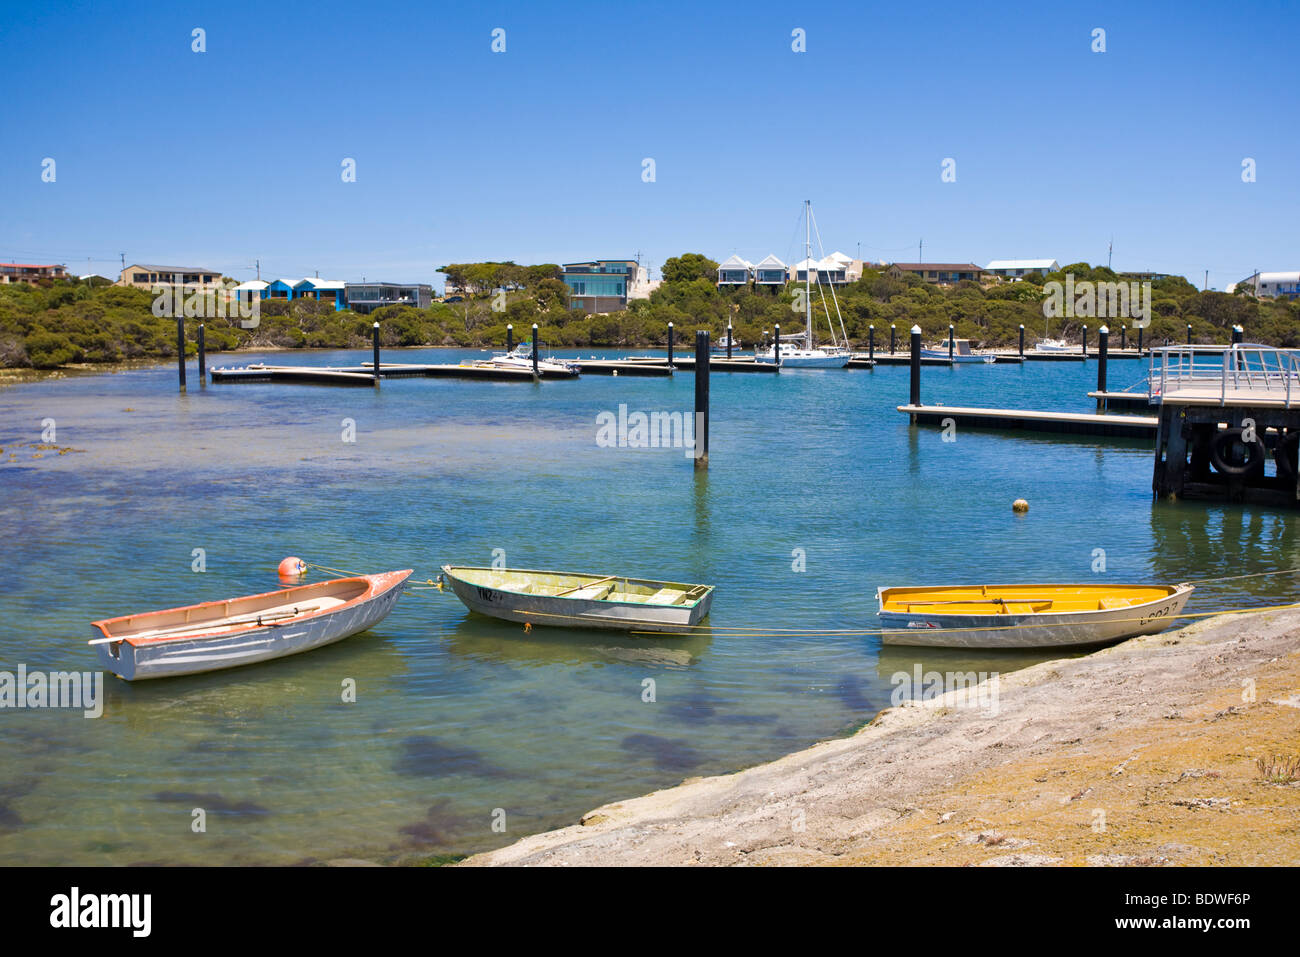 Boats in Robe Harbor, South Australia - Stock Image